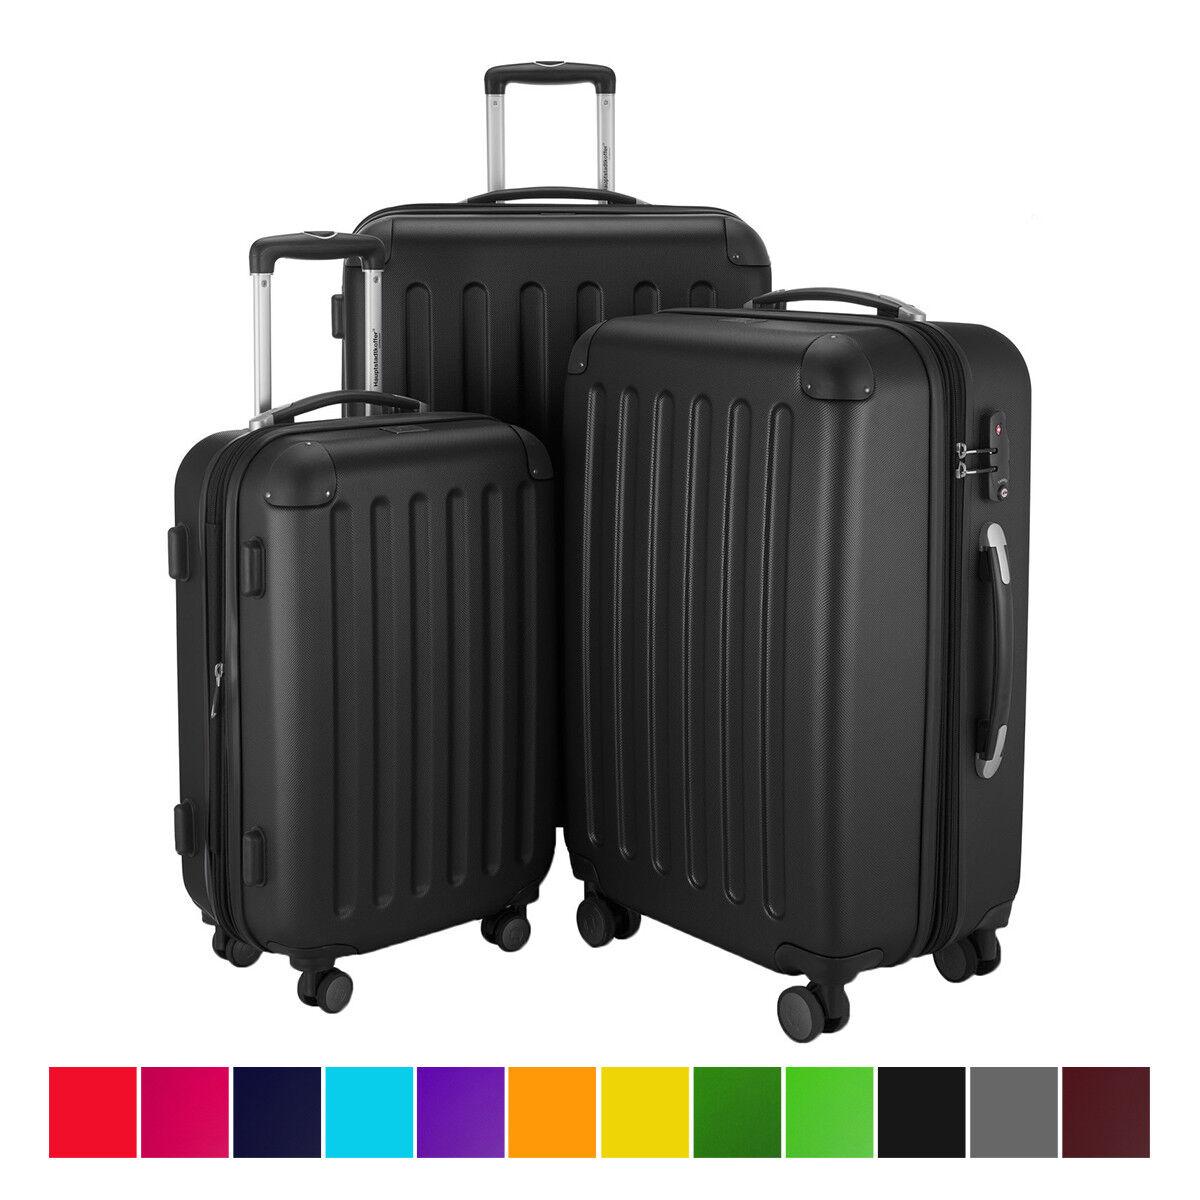 Capitale valise-Coque rigide 28') valise, Spree, TSA (20', 24' & 28') rigide 4362a0